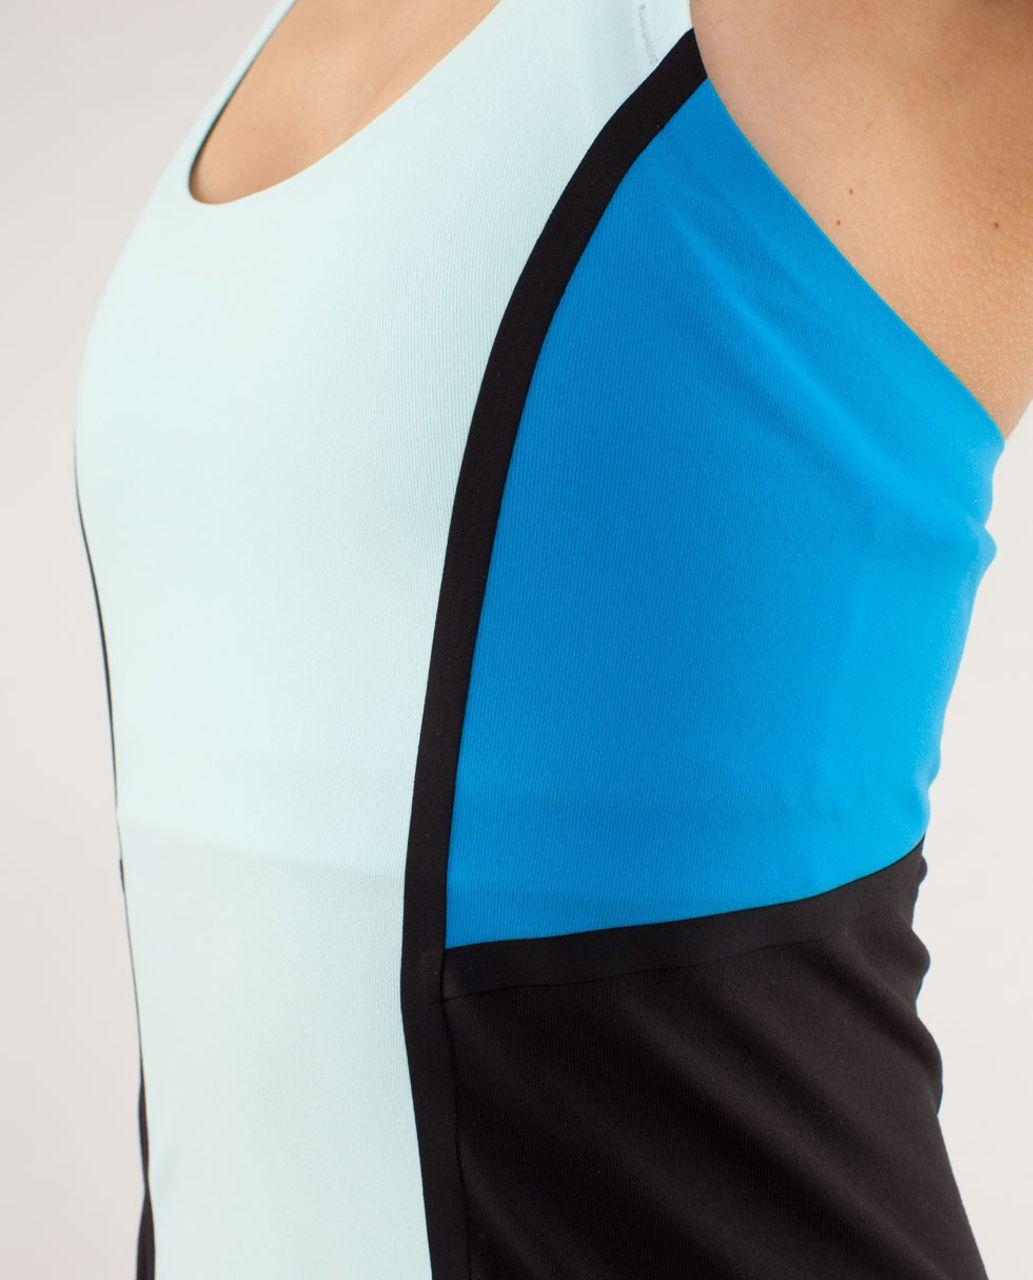 Lululemon Cool Racerback *Surf Bonded - Aquamarine / Beach Blanket Blue / Black